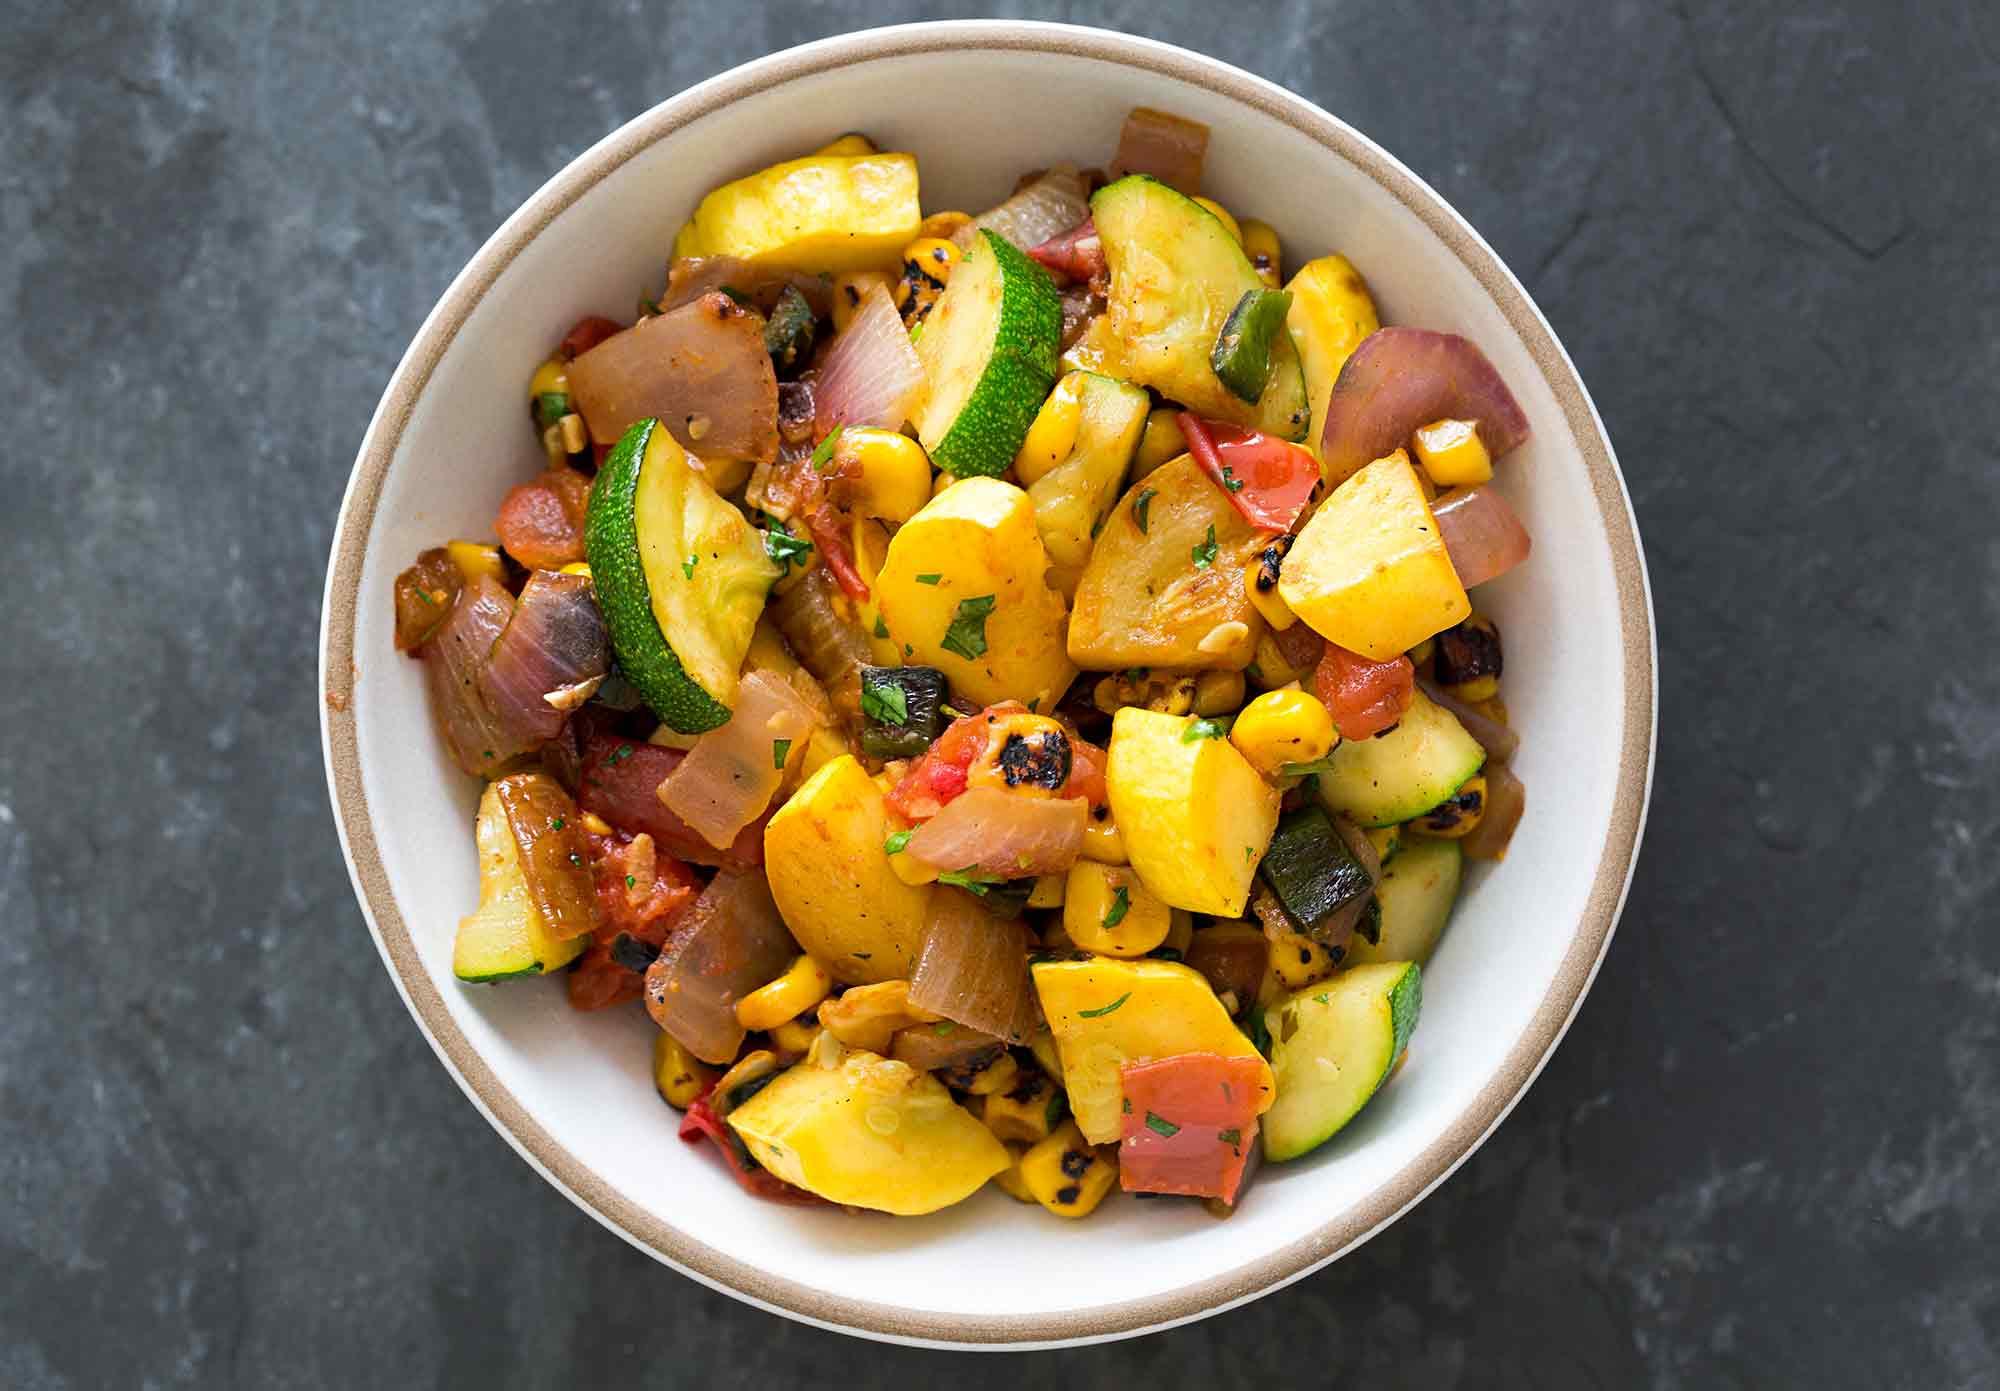 Summer Squash Recipes  Summer Squash Green Chile Stir Fry Recipe